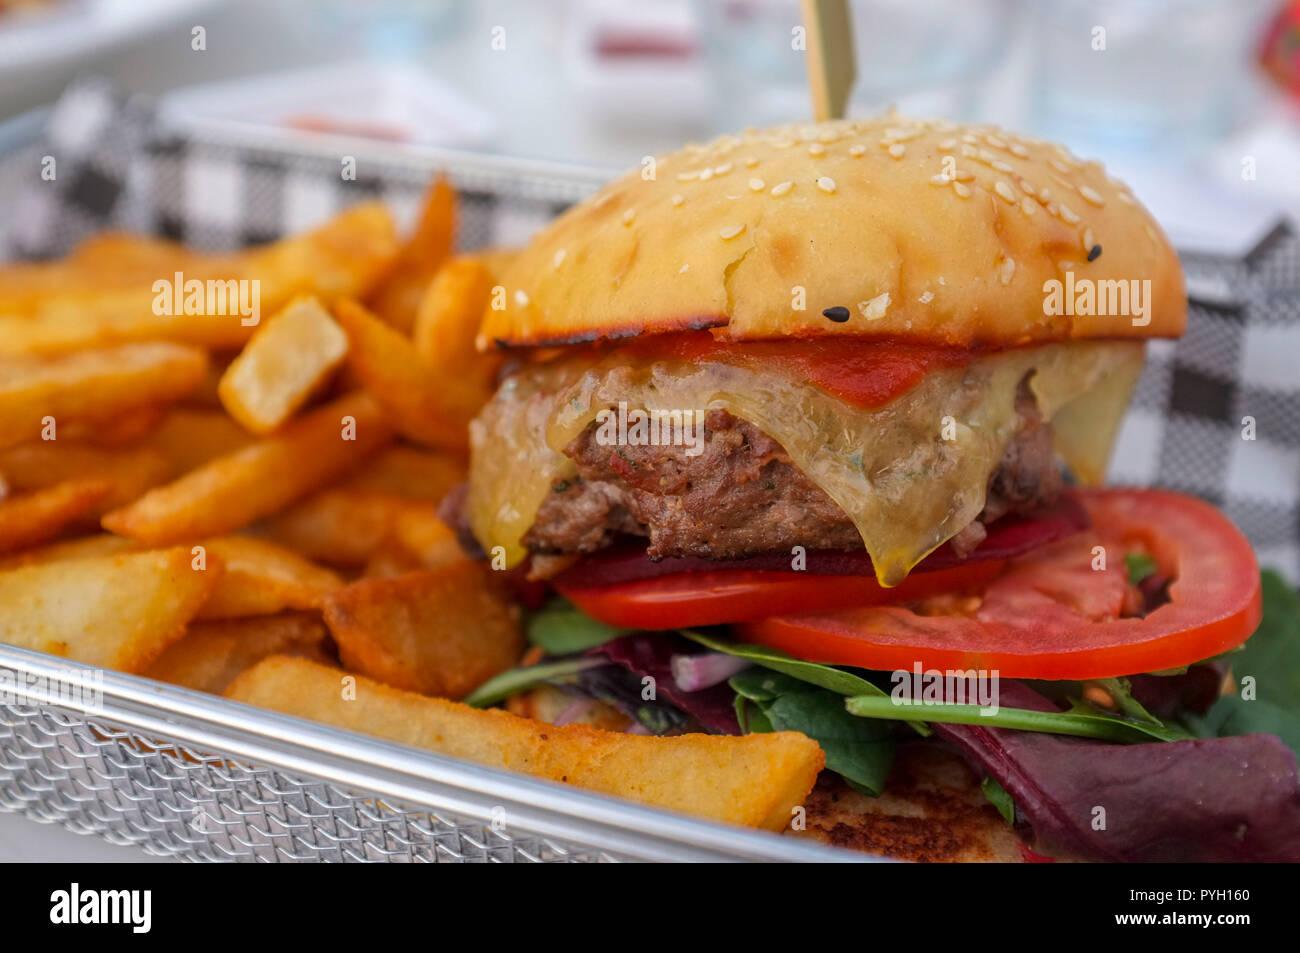 Hamburger with fries. Stock Photo